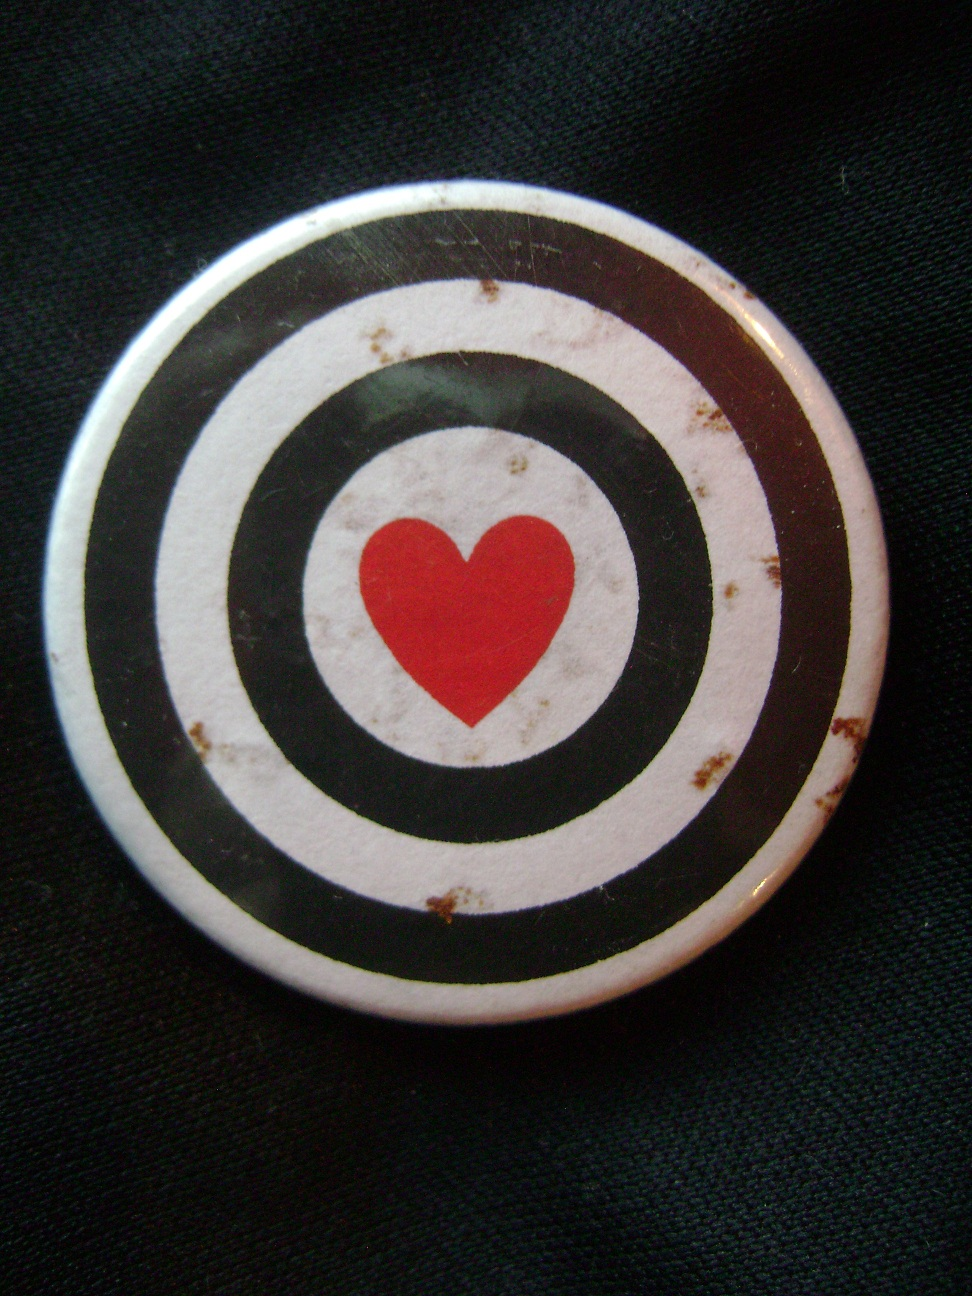 Bedz_Target_1.JPG